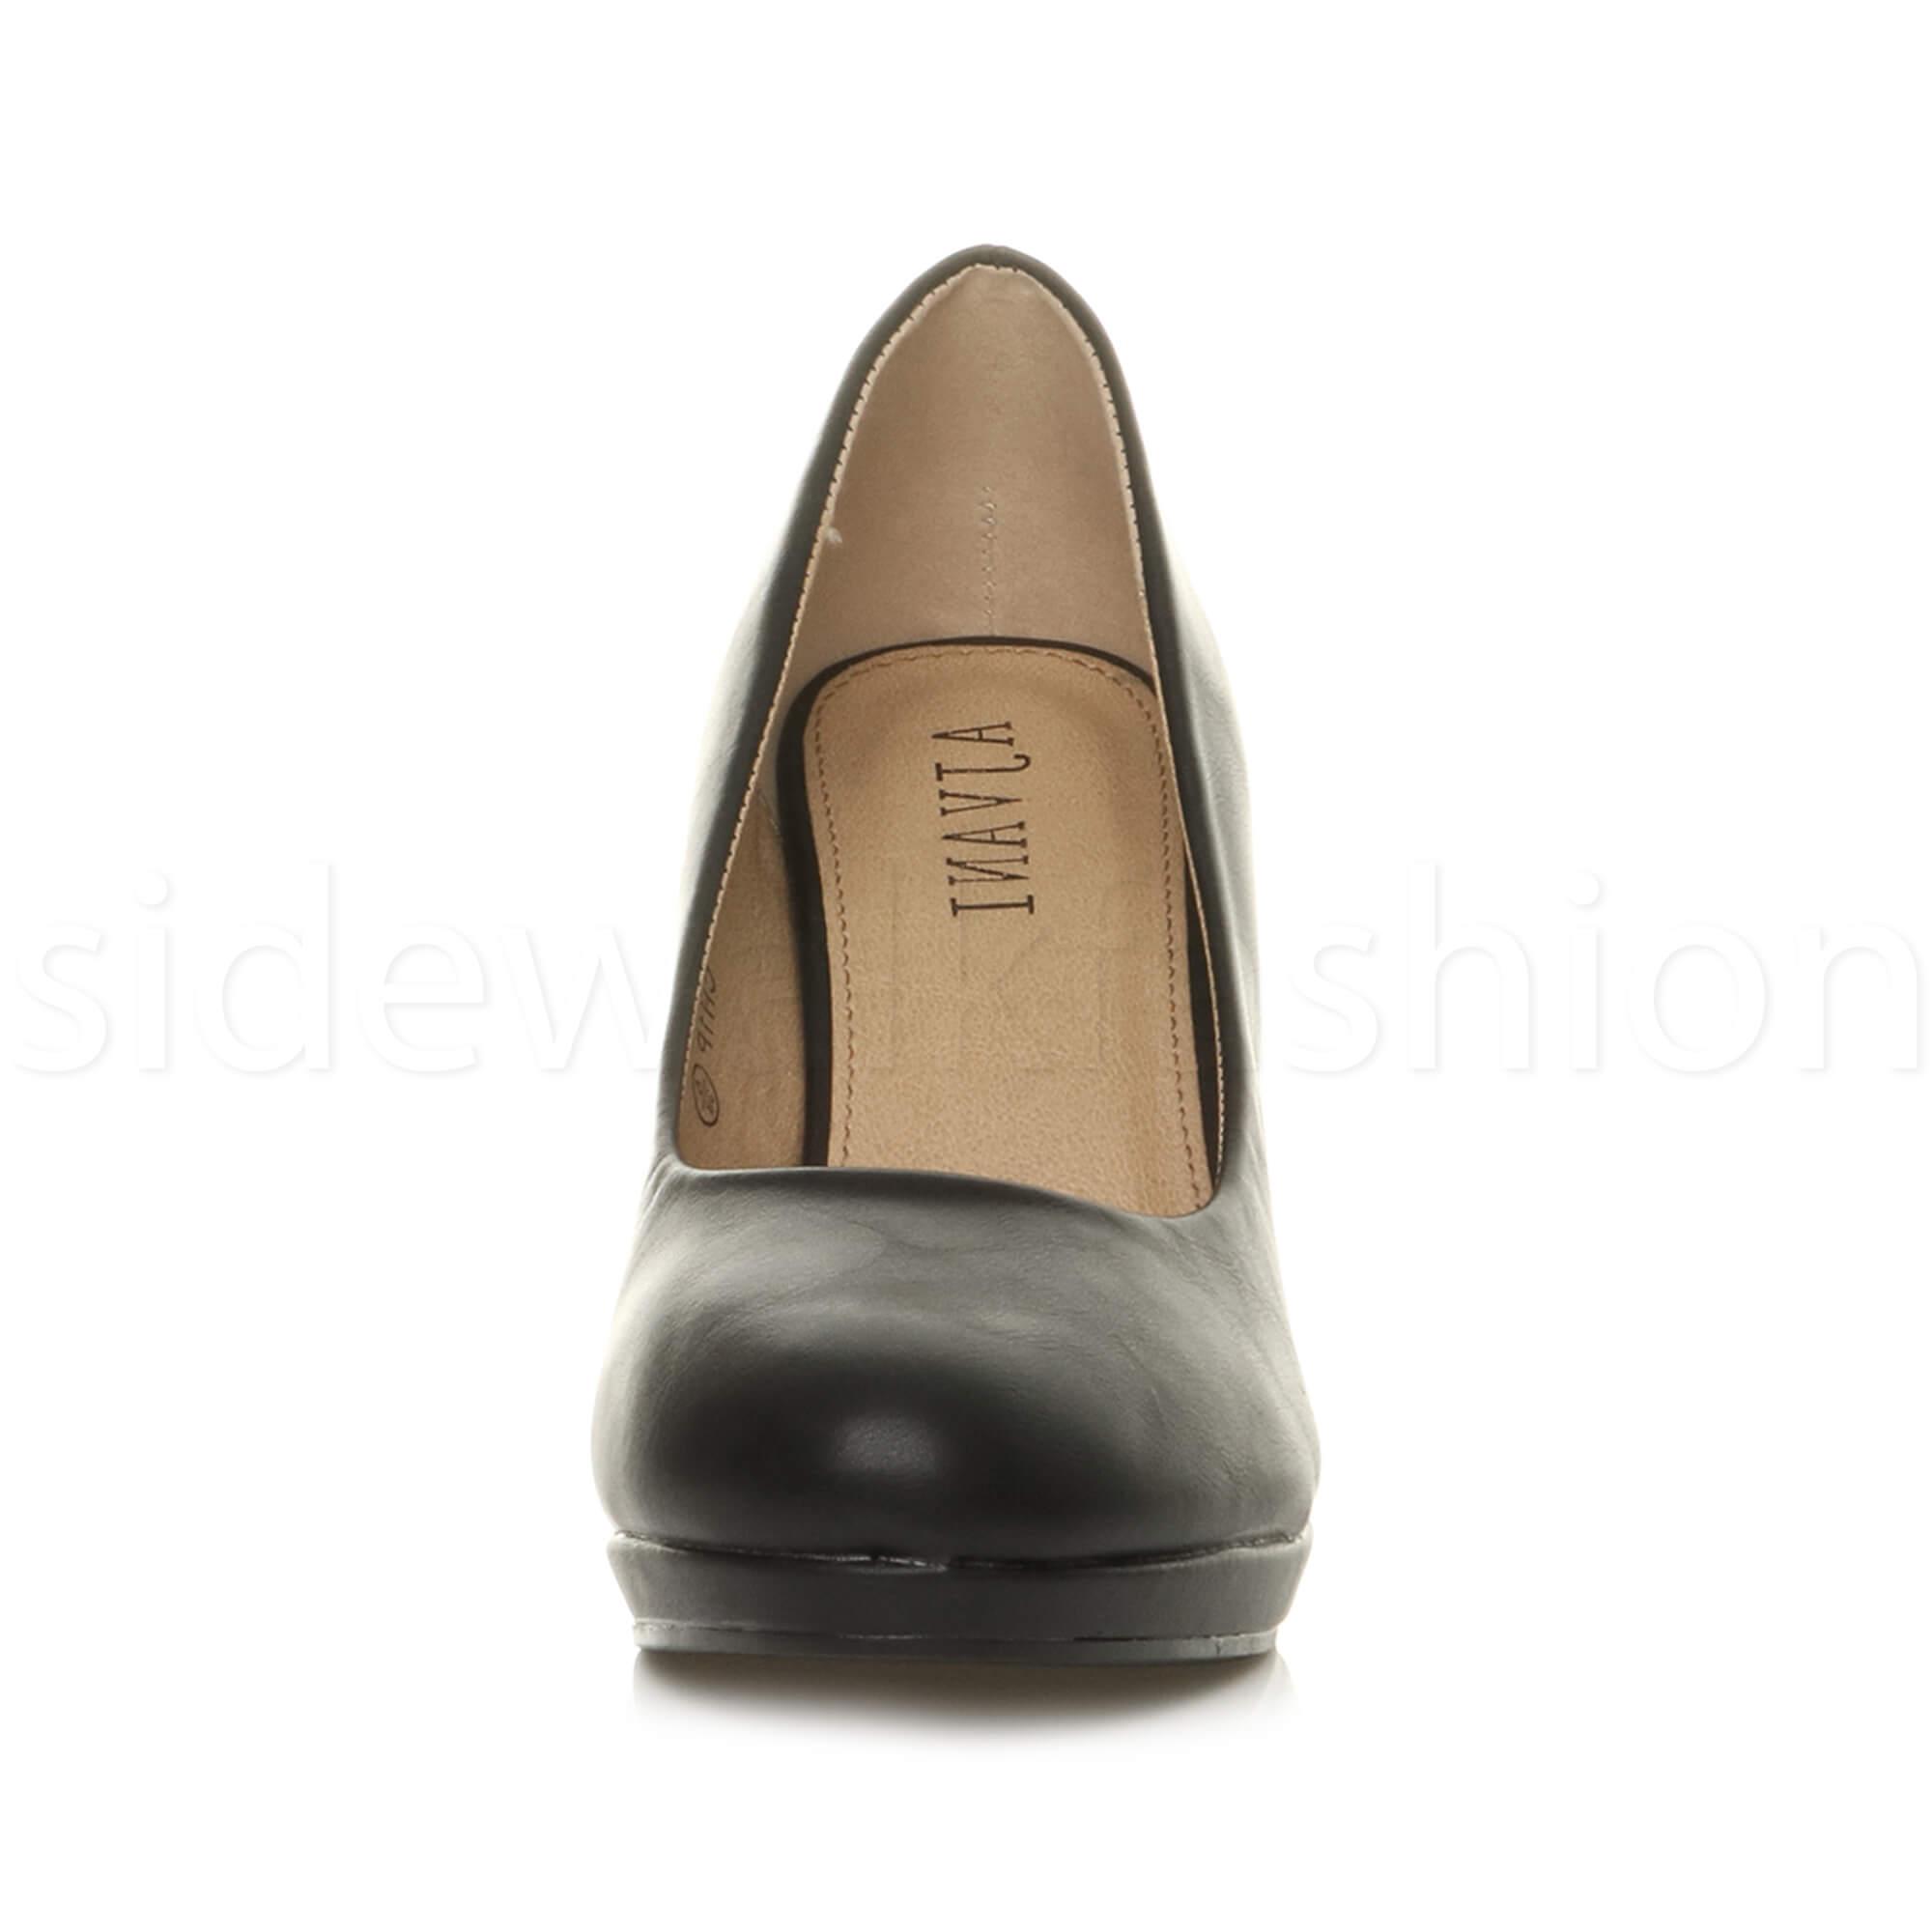 Womens-ladies-high-mid-heel-platform-wedding-evening-bridesmaid-court-shoes-size thumbnail 20